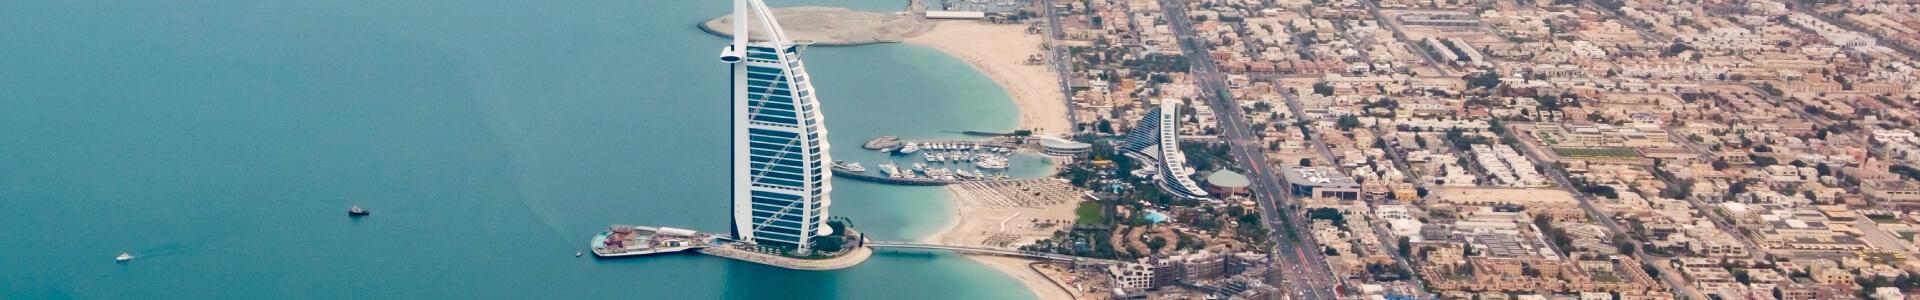 chip-prepago-emiratos-arabes